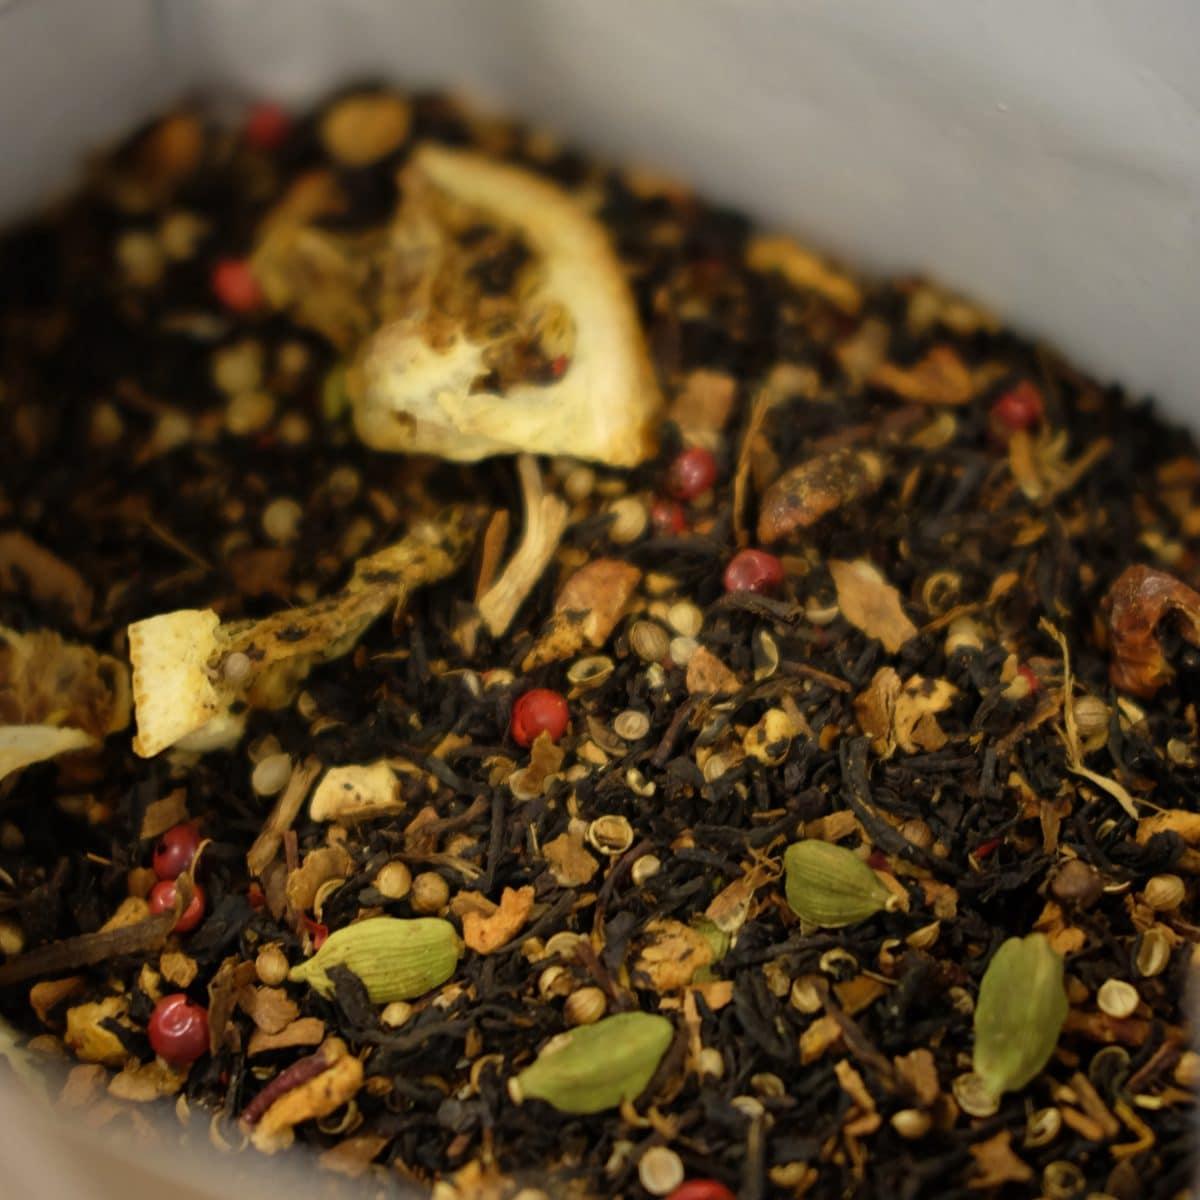 Zwarte thee met appelsien en koekjessmaak